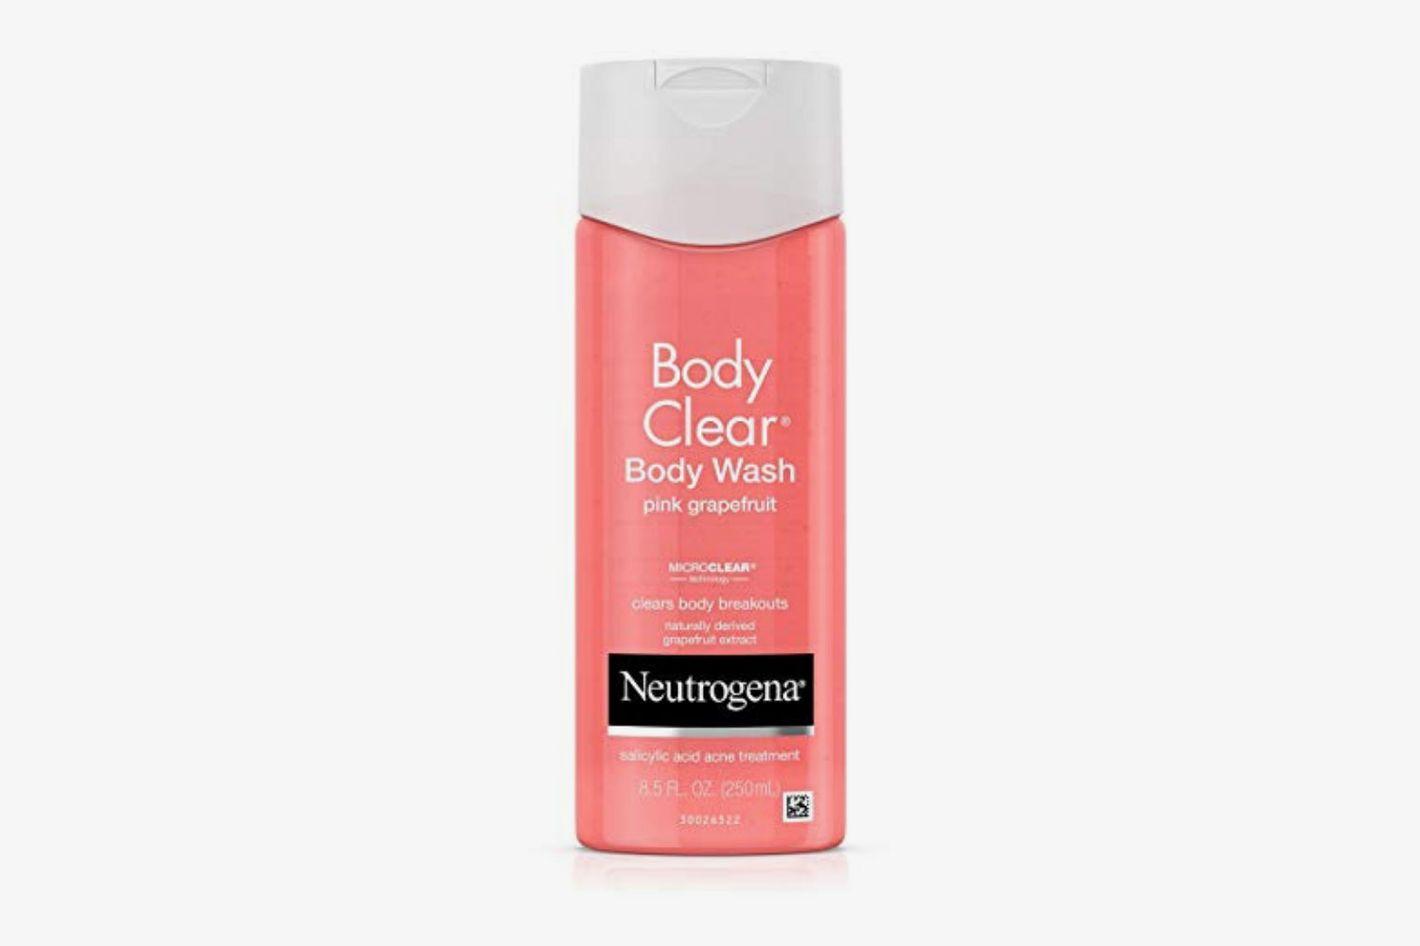 23a4795189cc5 Neutrogena Body Clear Body Wash with Salicylic Acid Acne Treatment  (Three-Pack)